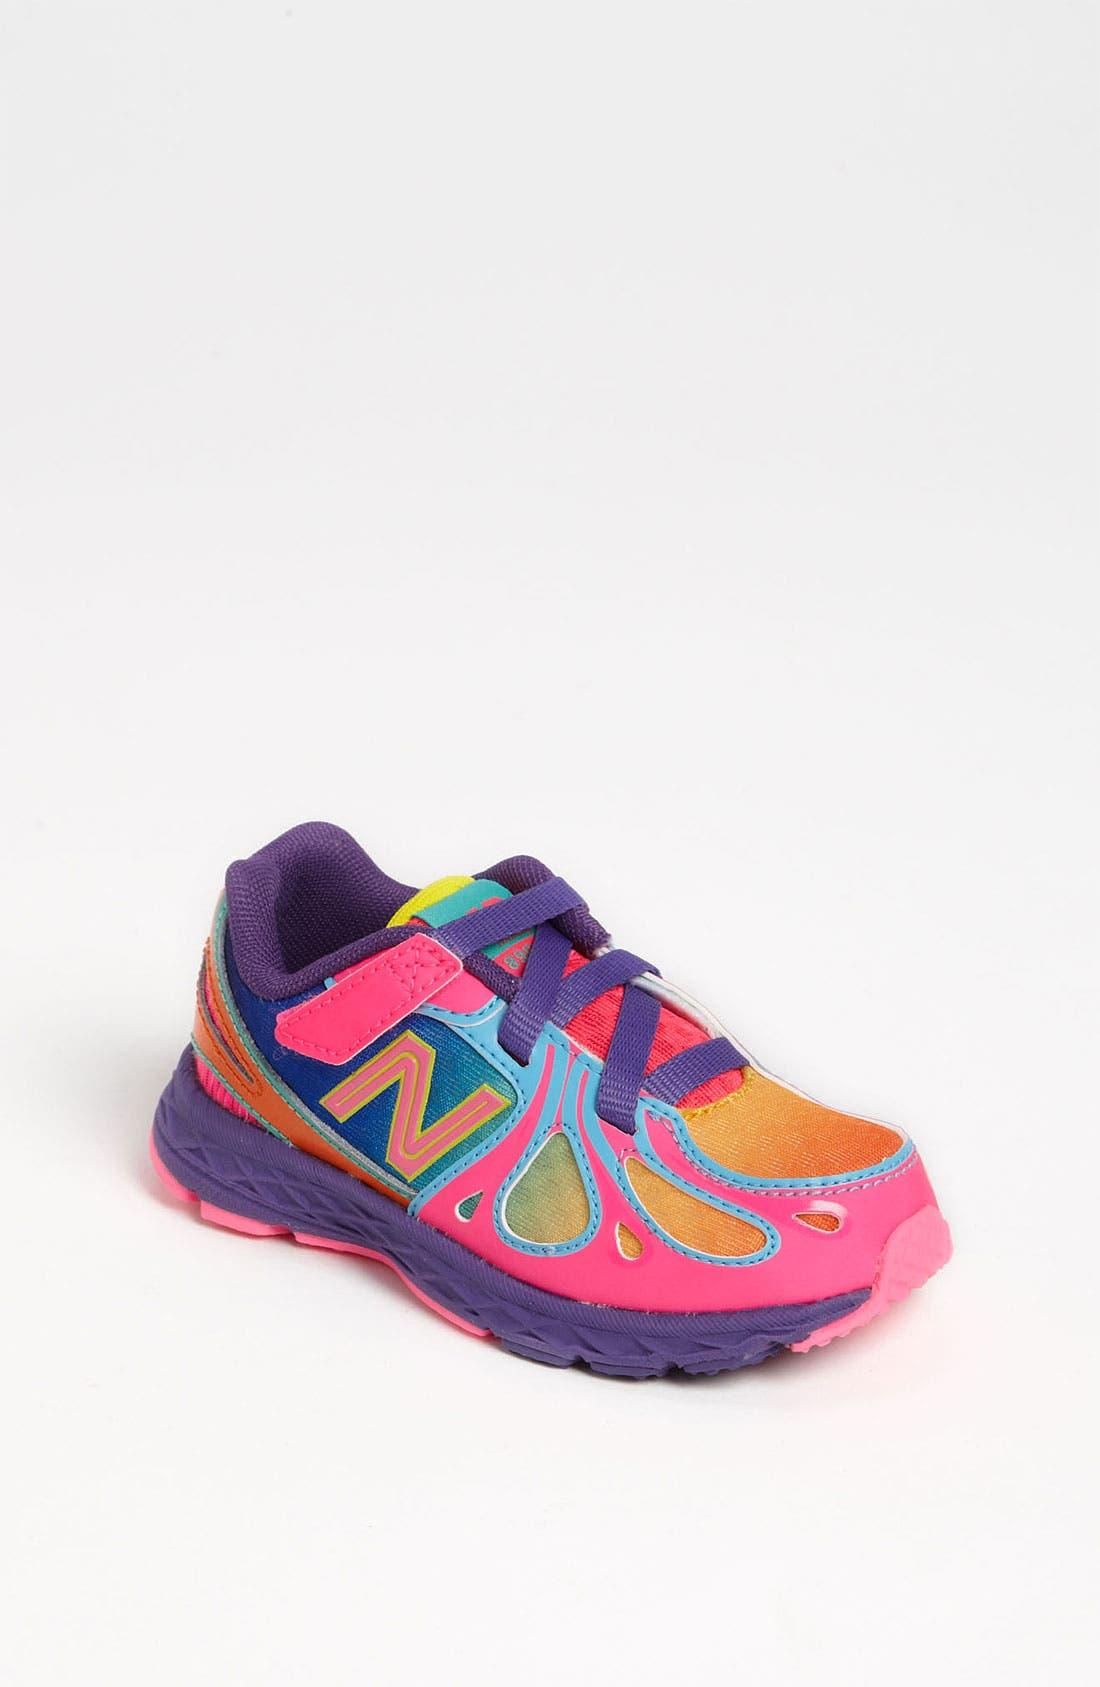 Main Image - New Balance '890' Sneaker (Baby, Walker & Toddler)